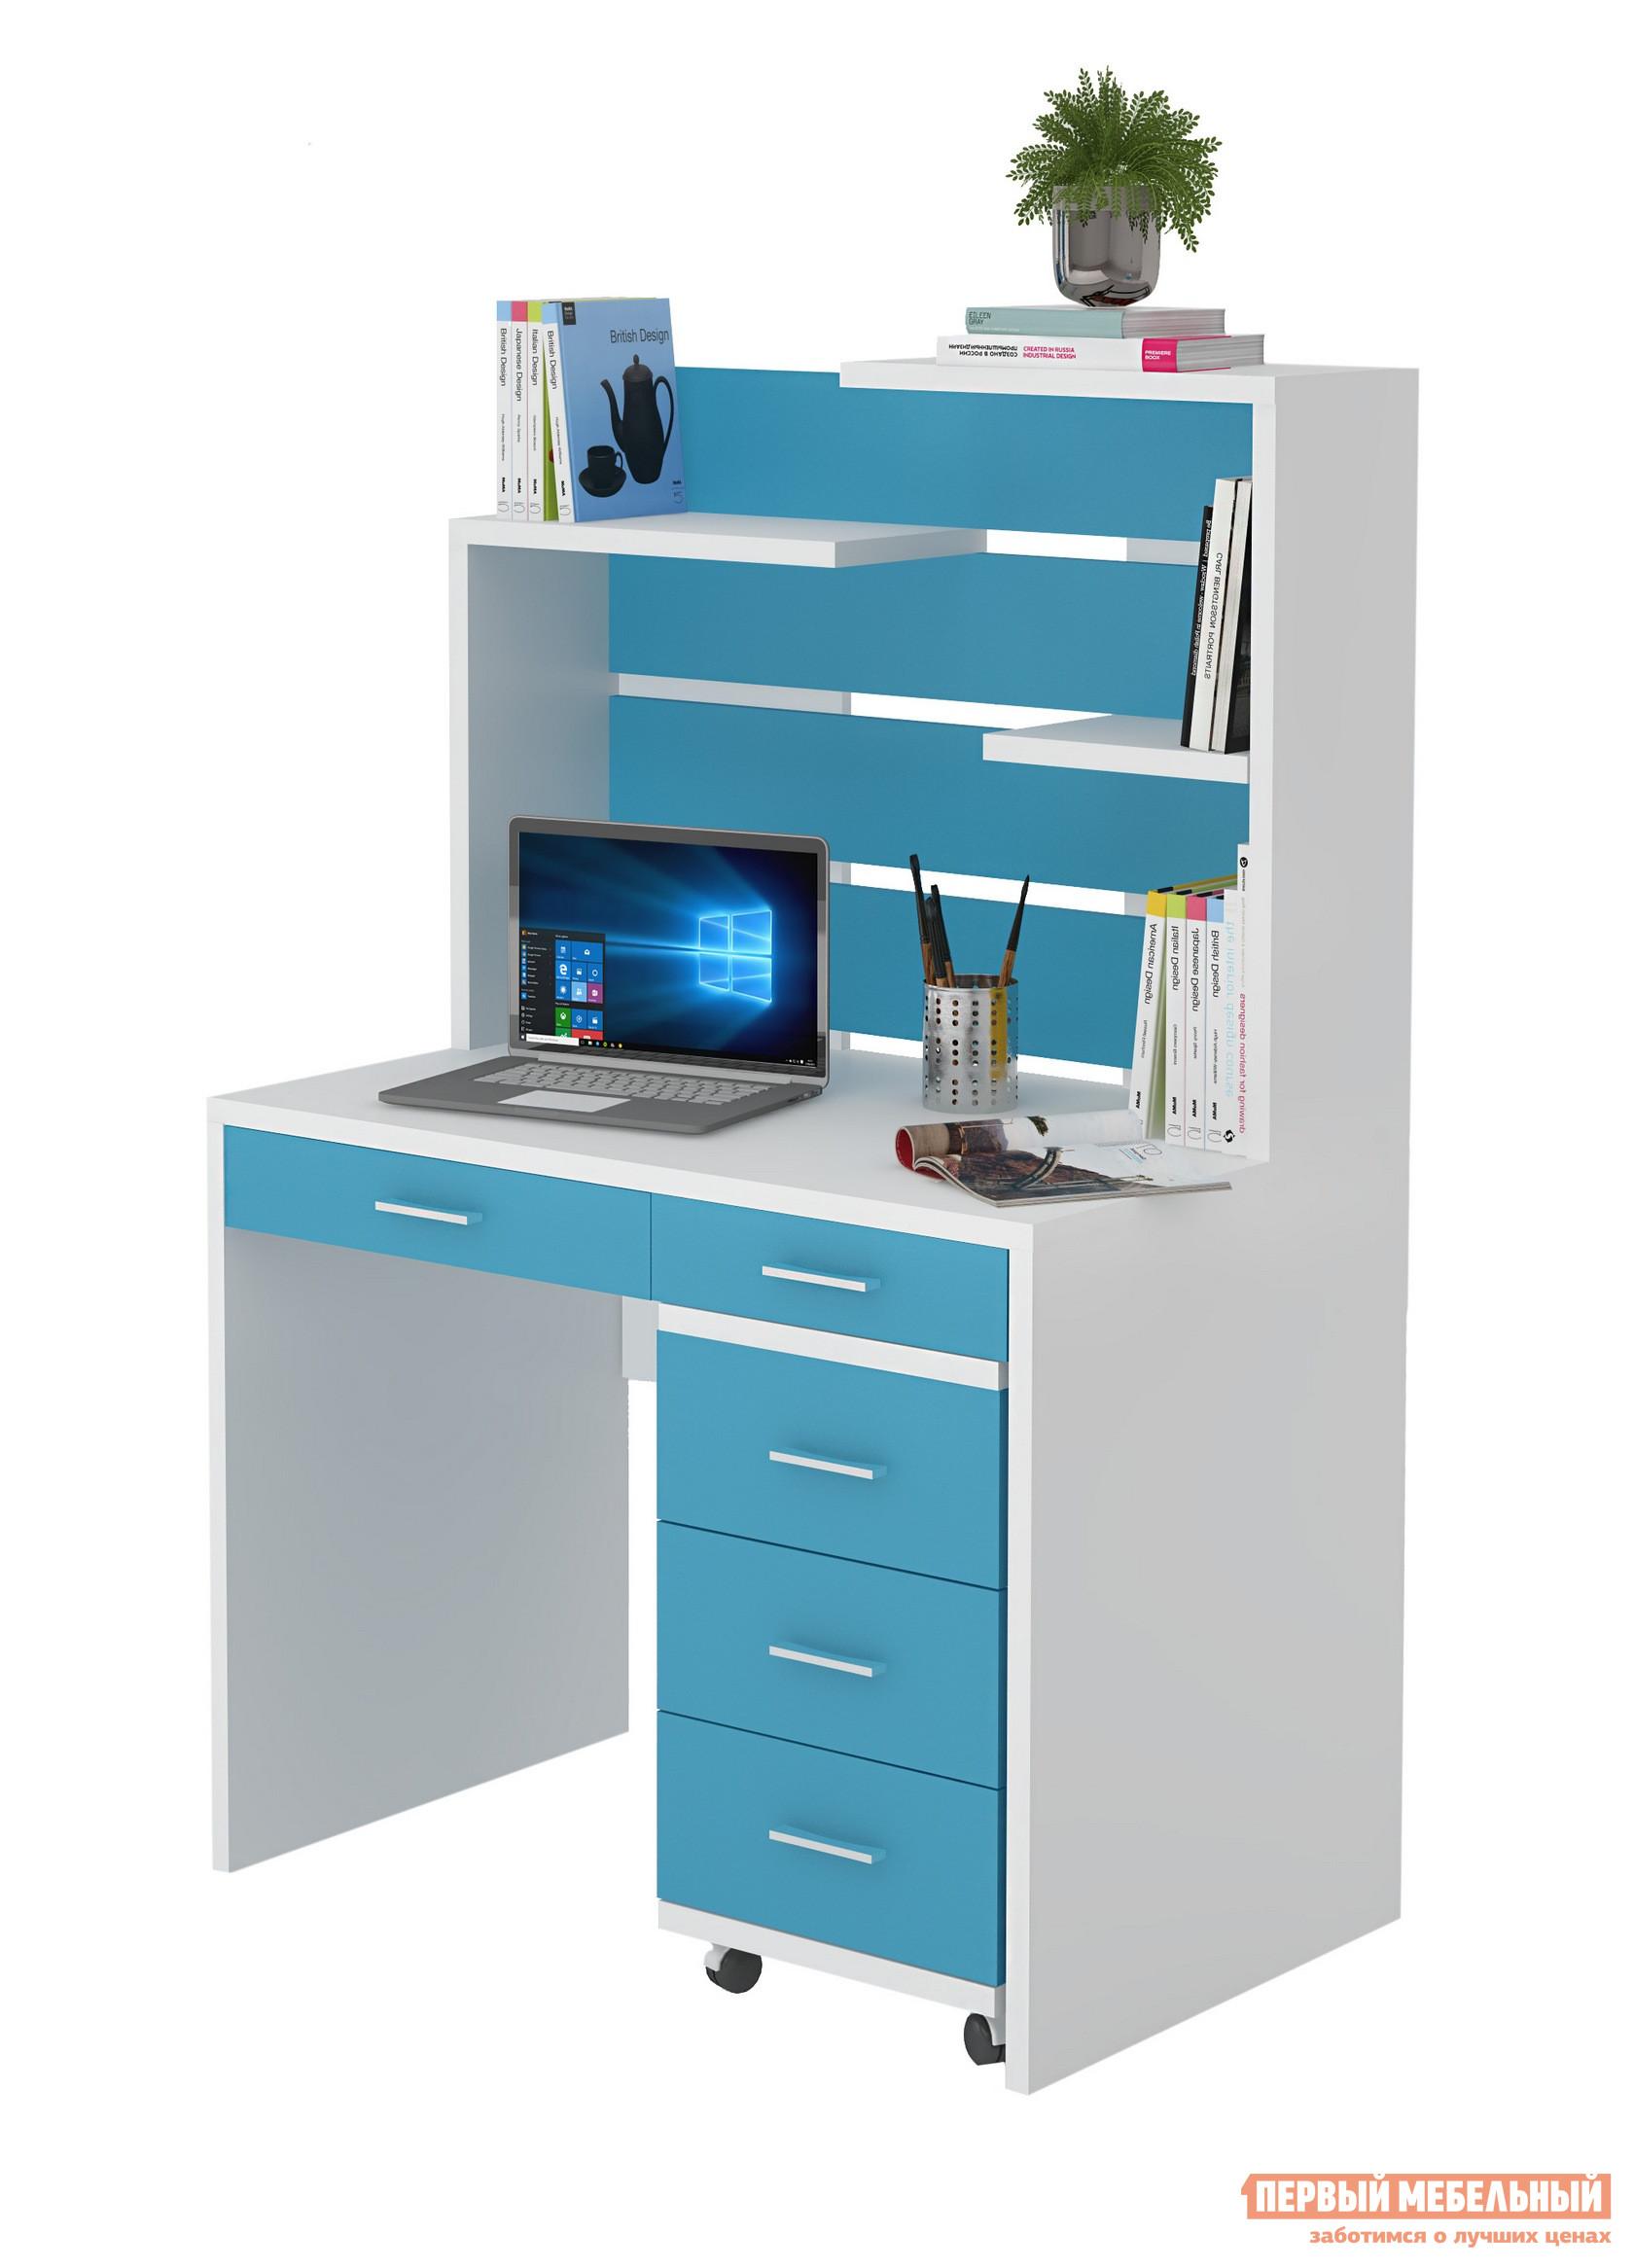 Компьютерный стол детский Мэрдэс СП-22-СП-22Н+ТС-2 1kg vitamin b8 food grade 2% usa imported